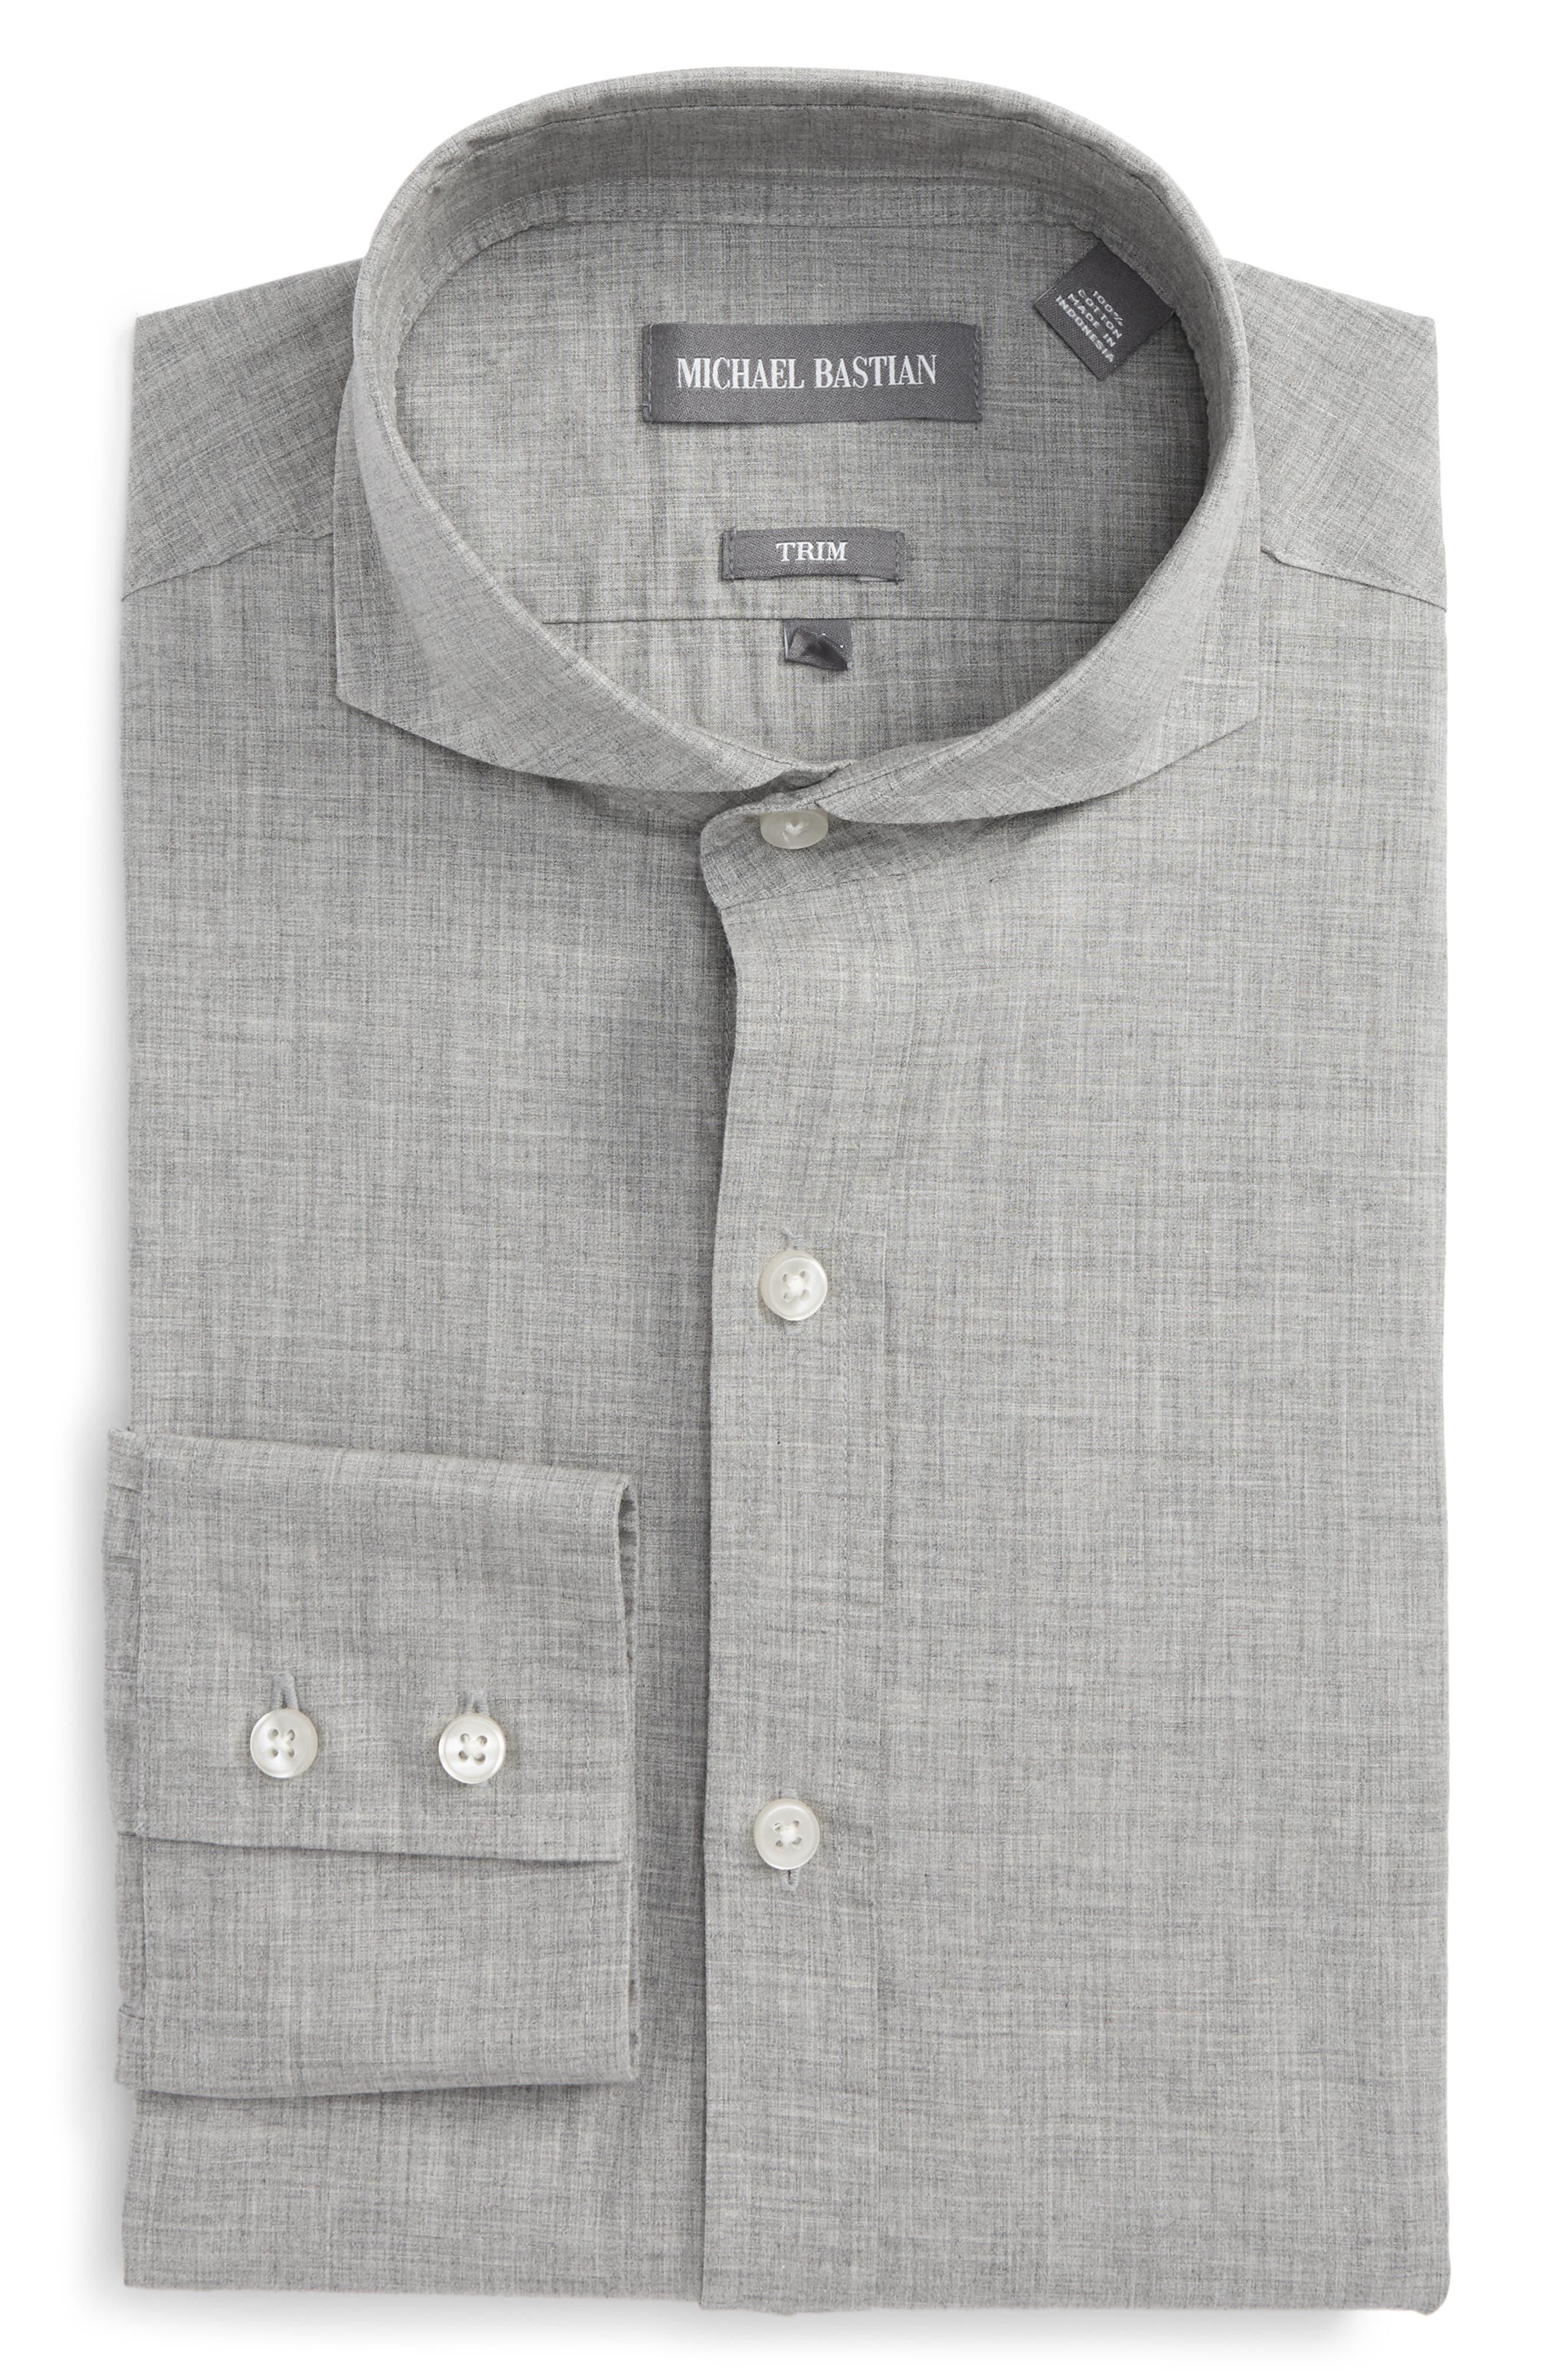 Michael Bastian Trim Fit Dress Shirt